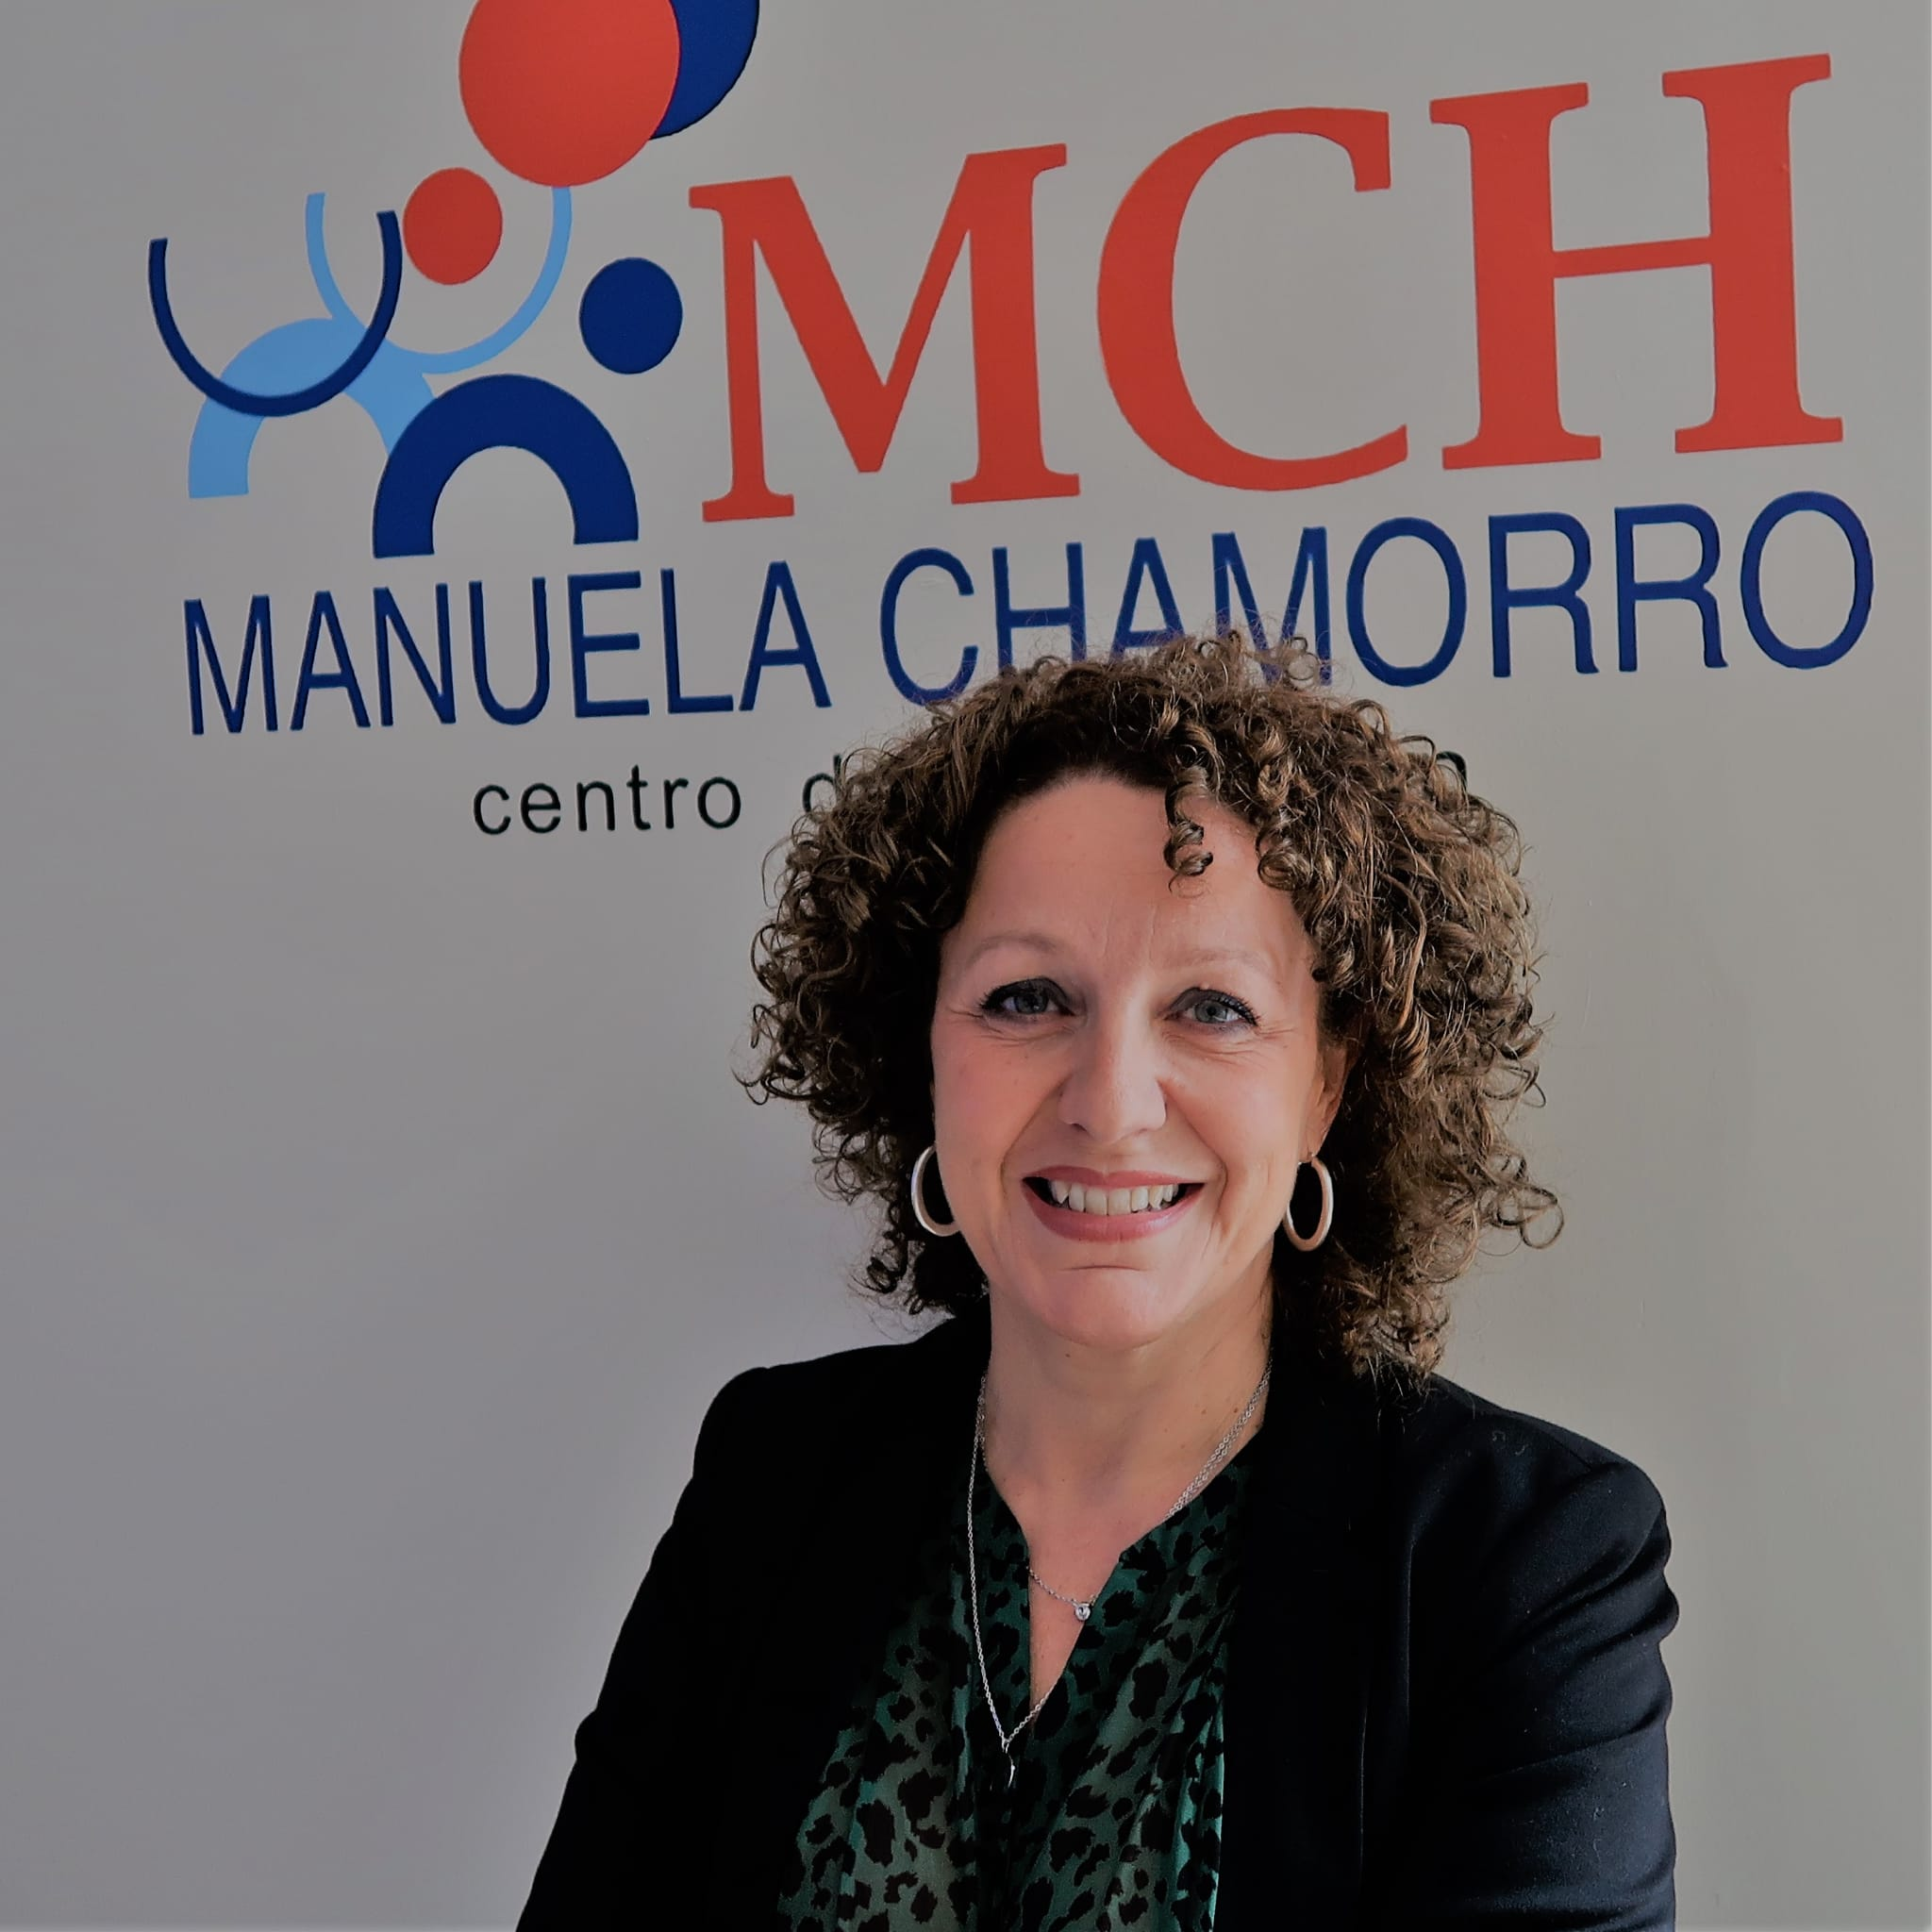 Manuela Chamorro. Academia y coaching